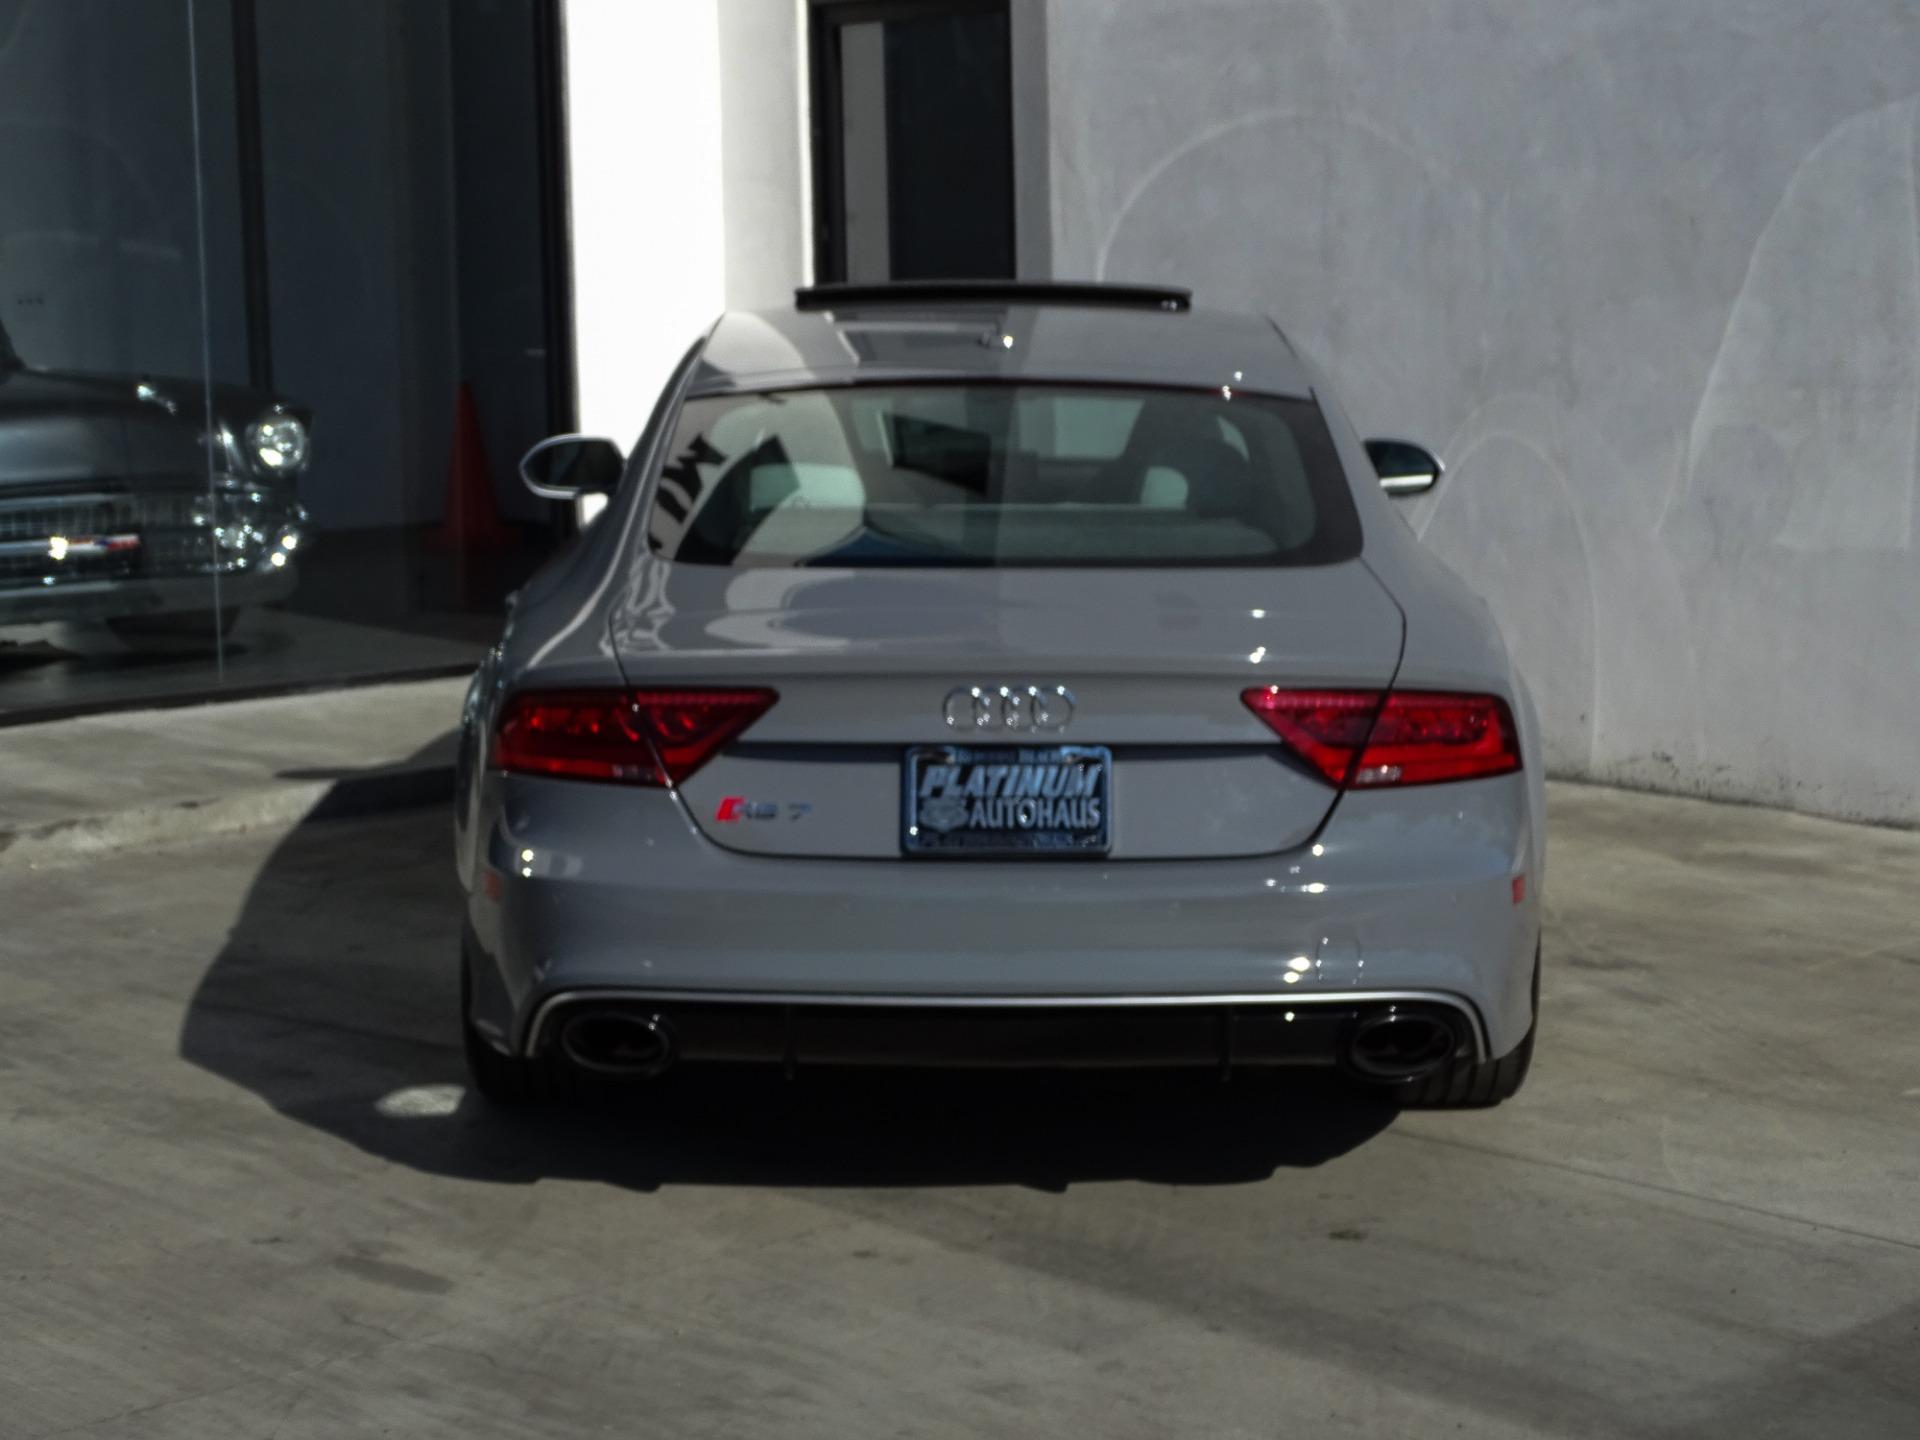 Audi Dealer Near Me >> 2015 Audi RS7 4.0T quattro Prestige Stock # 6330 for sale ...